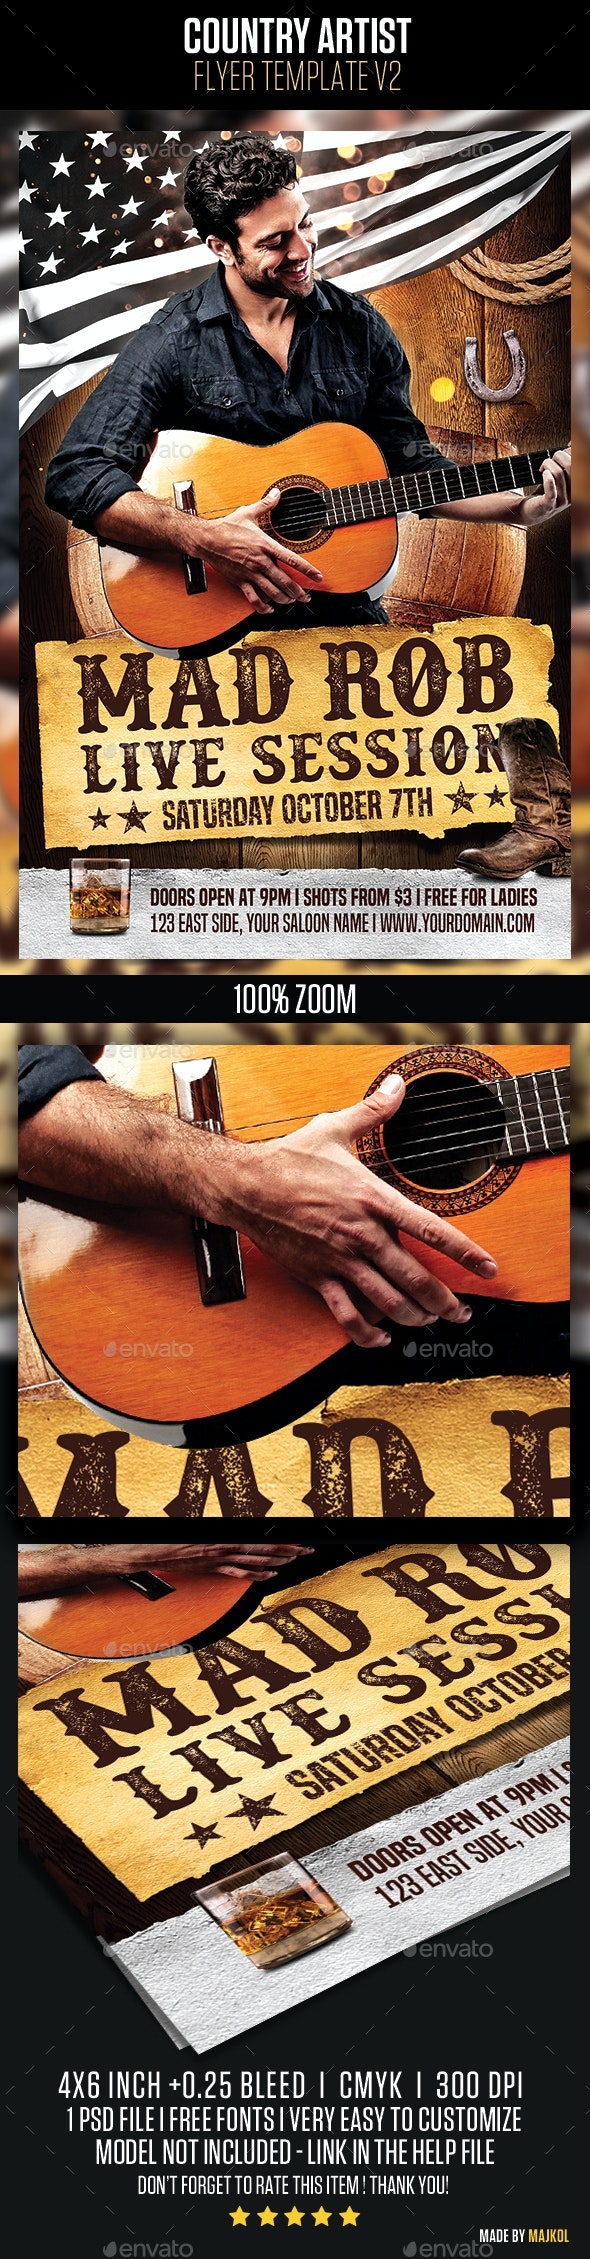 Country Artist Flyer v2 - Concerts Events